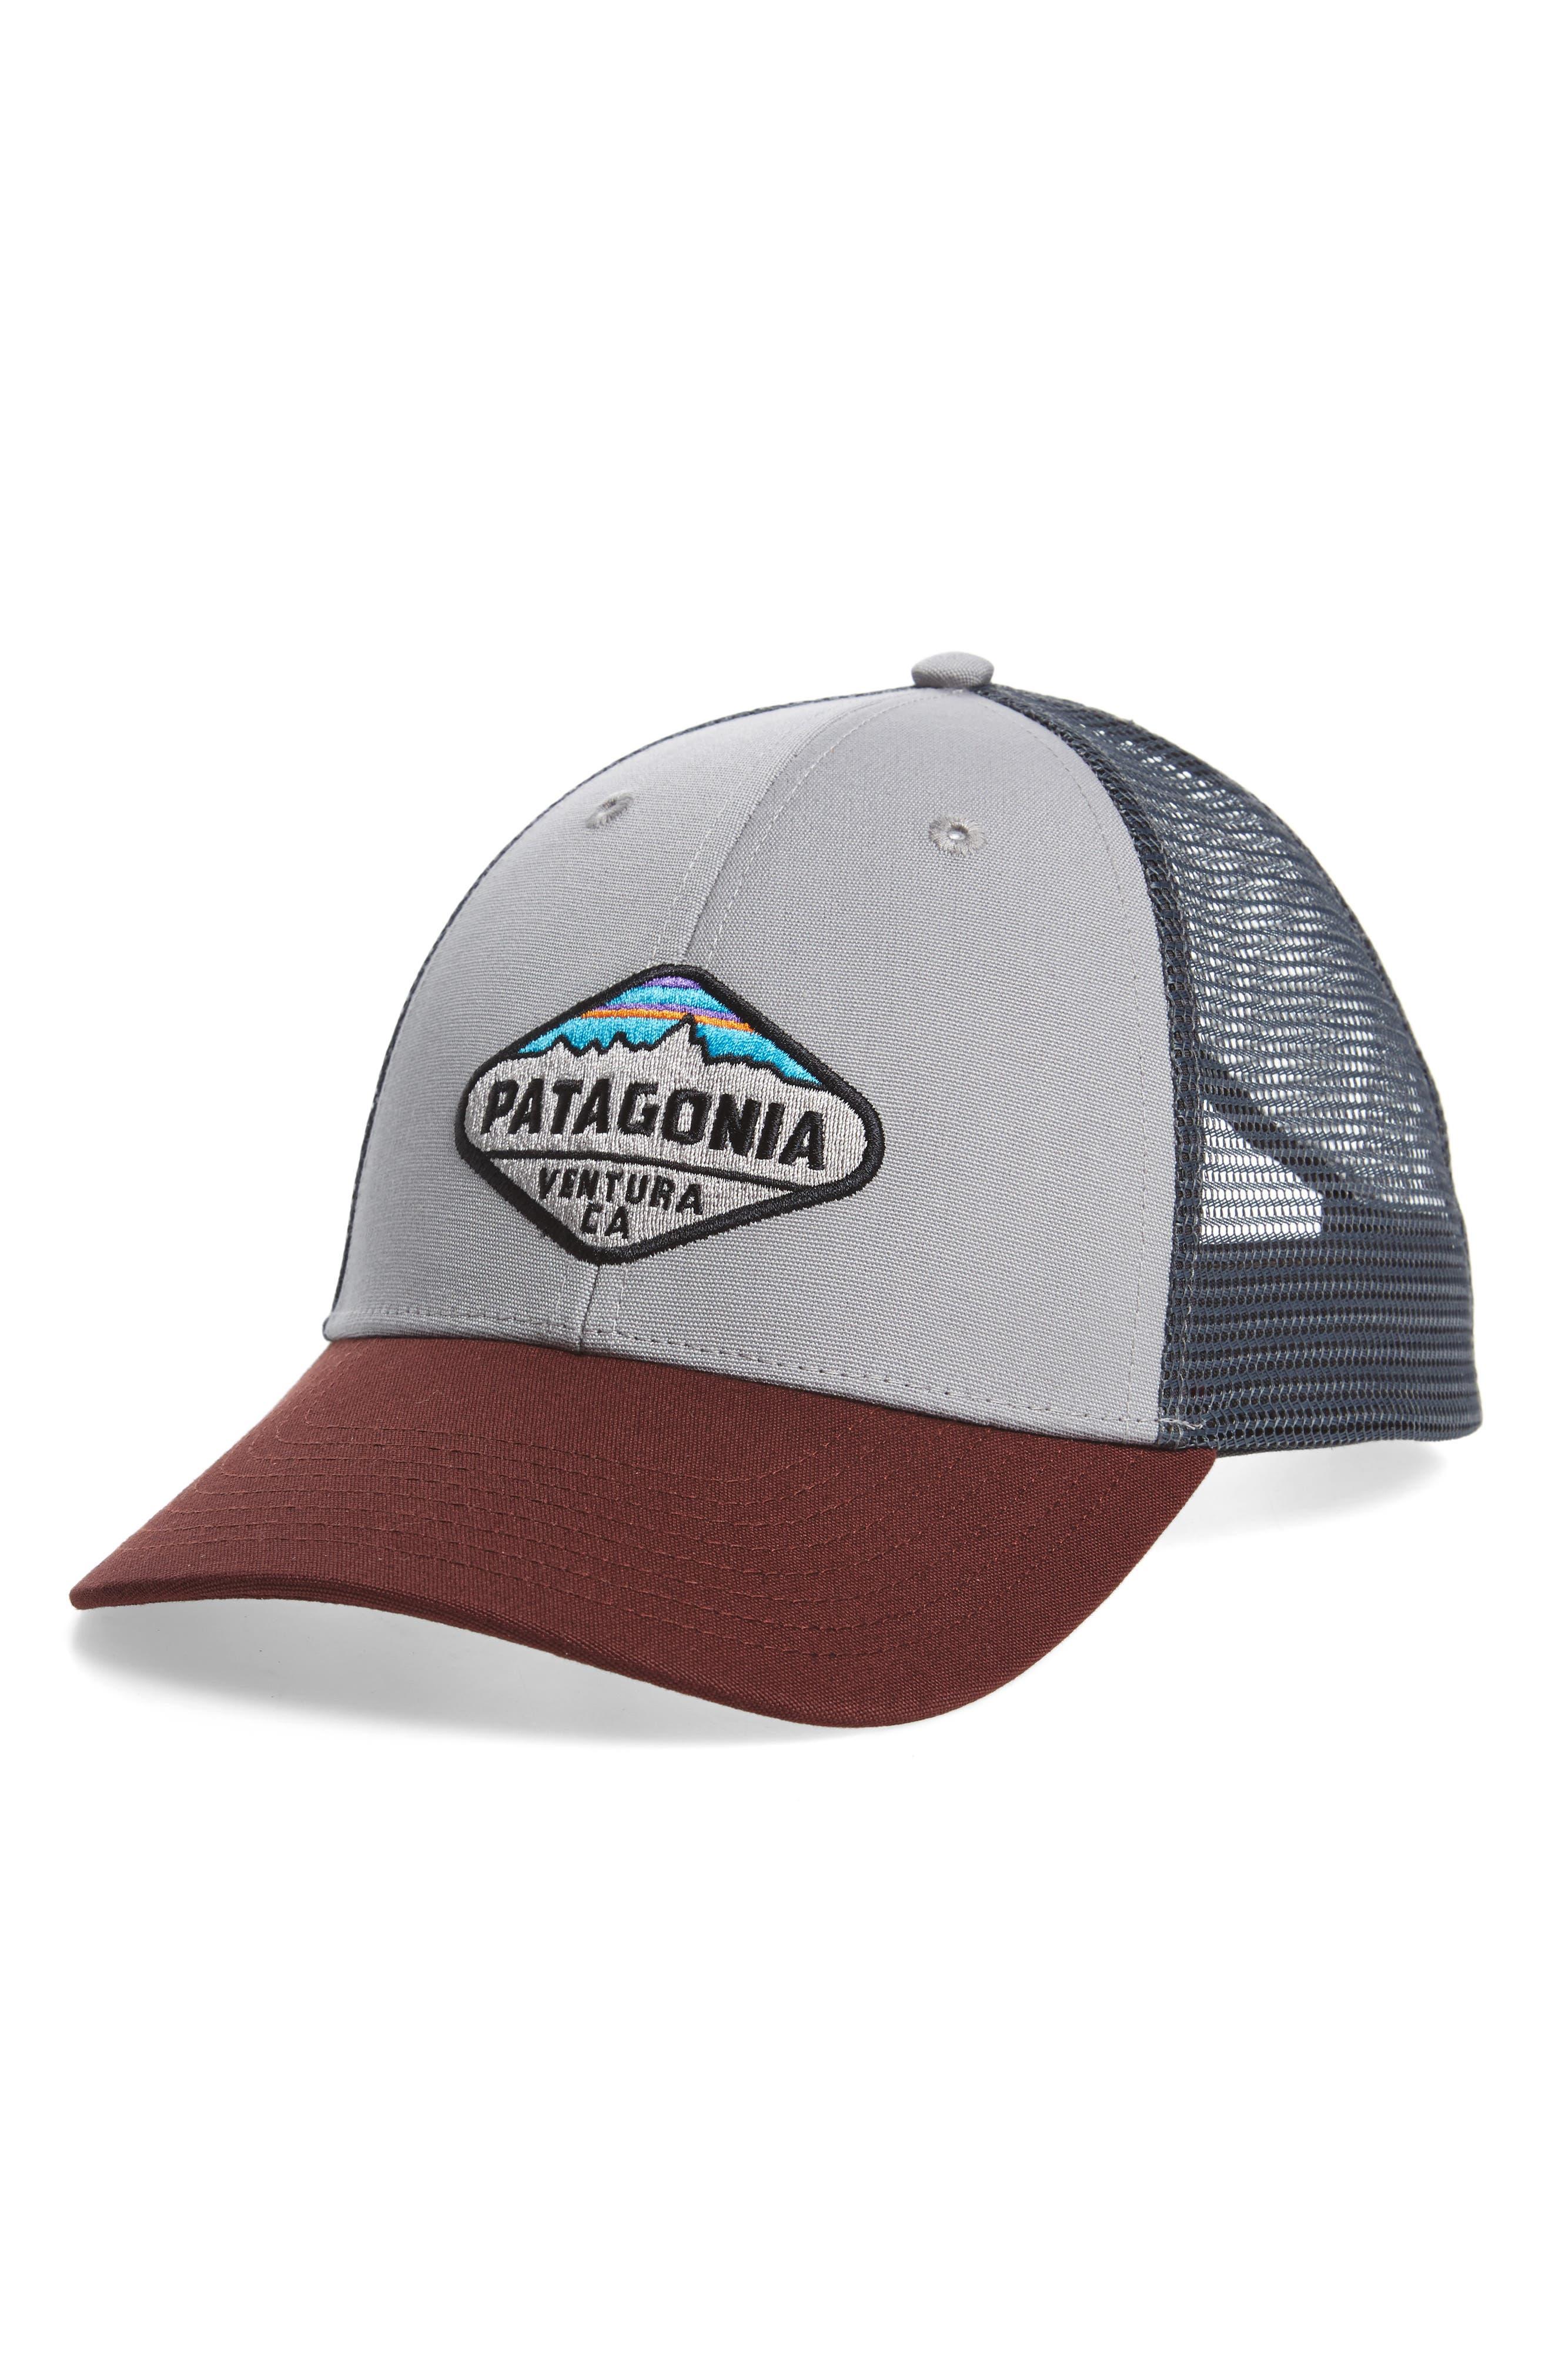 Main Image - Patagonia 'FitzRoy Crest' Trucker Hat